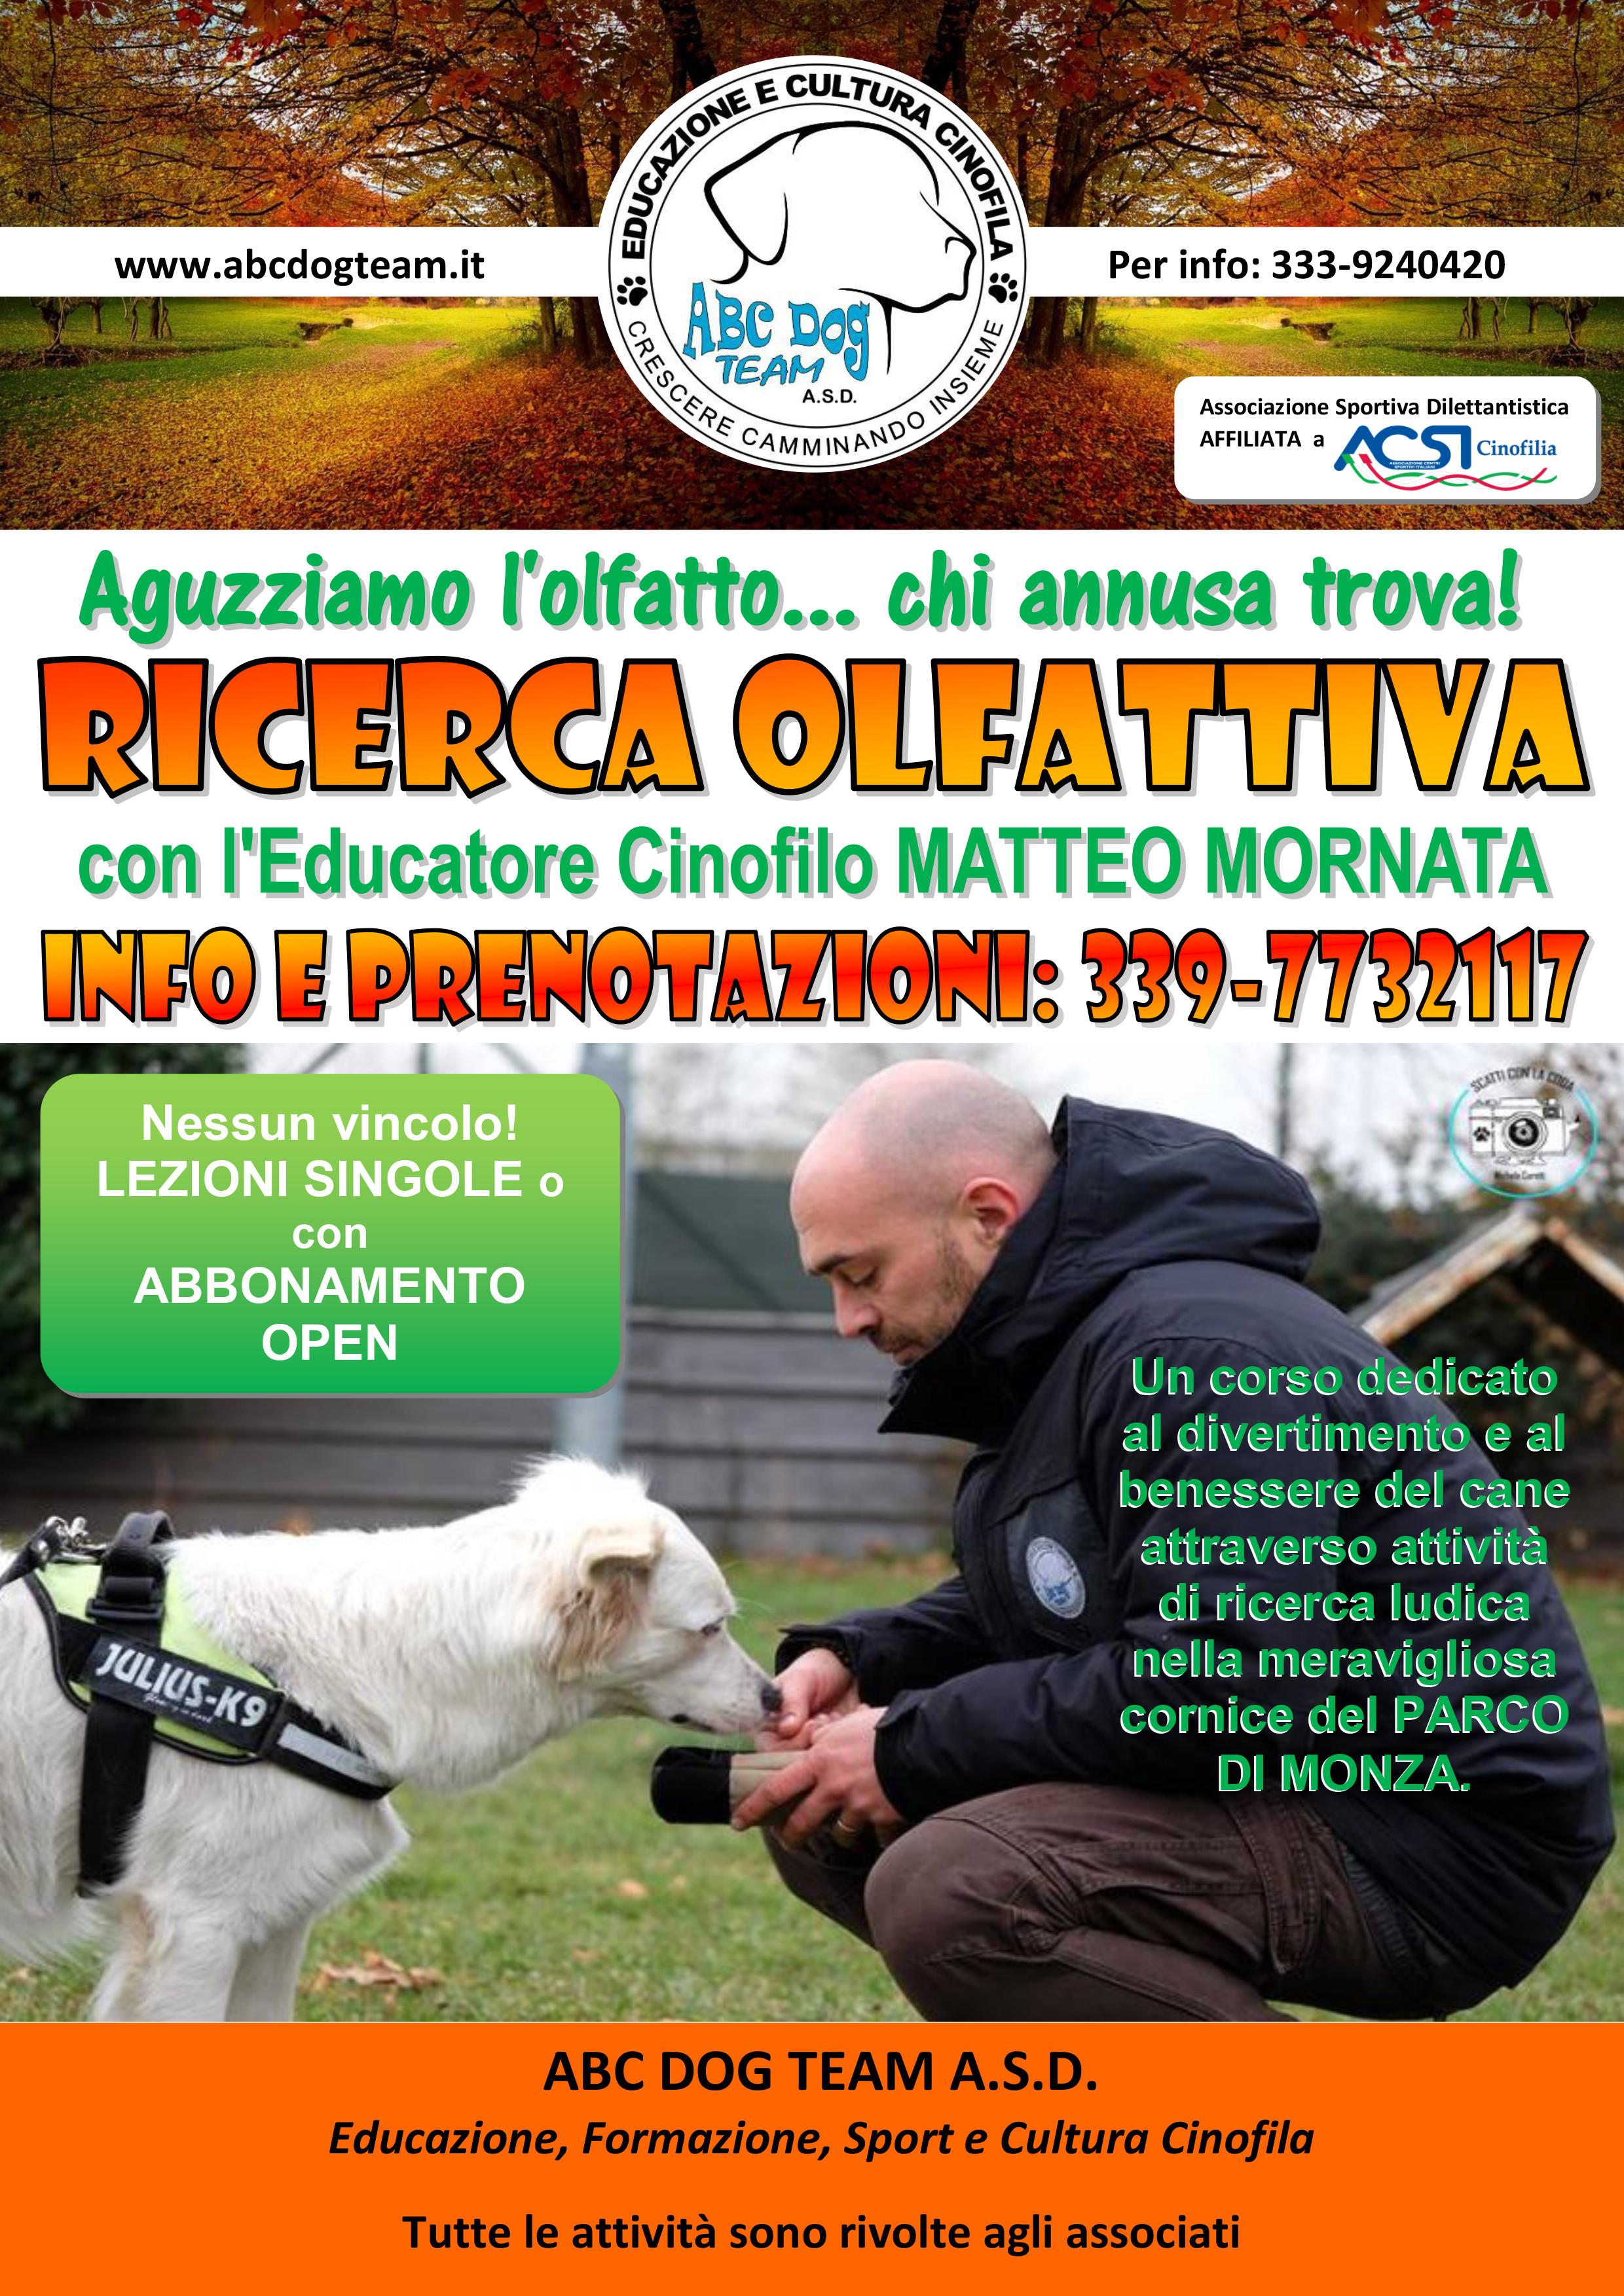 Abc Dog Team RICERCA OLFATTIVA 2019